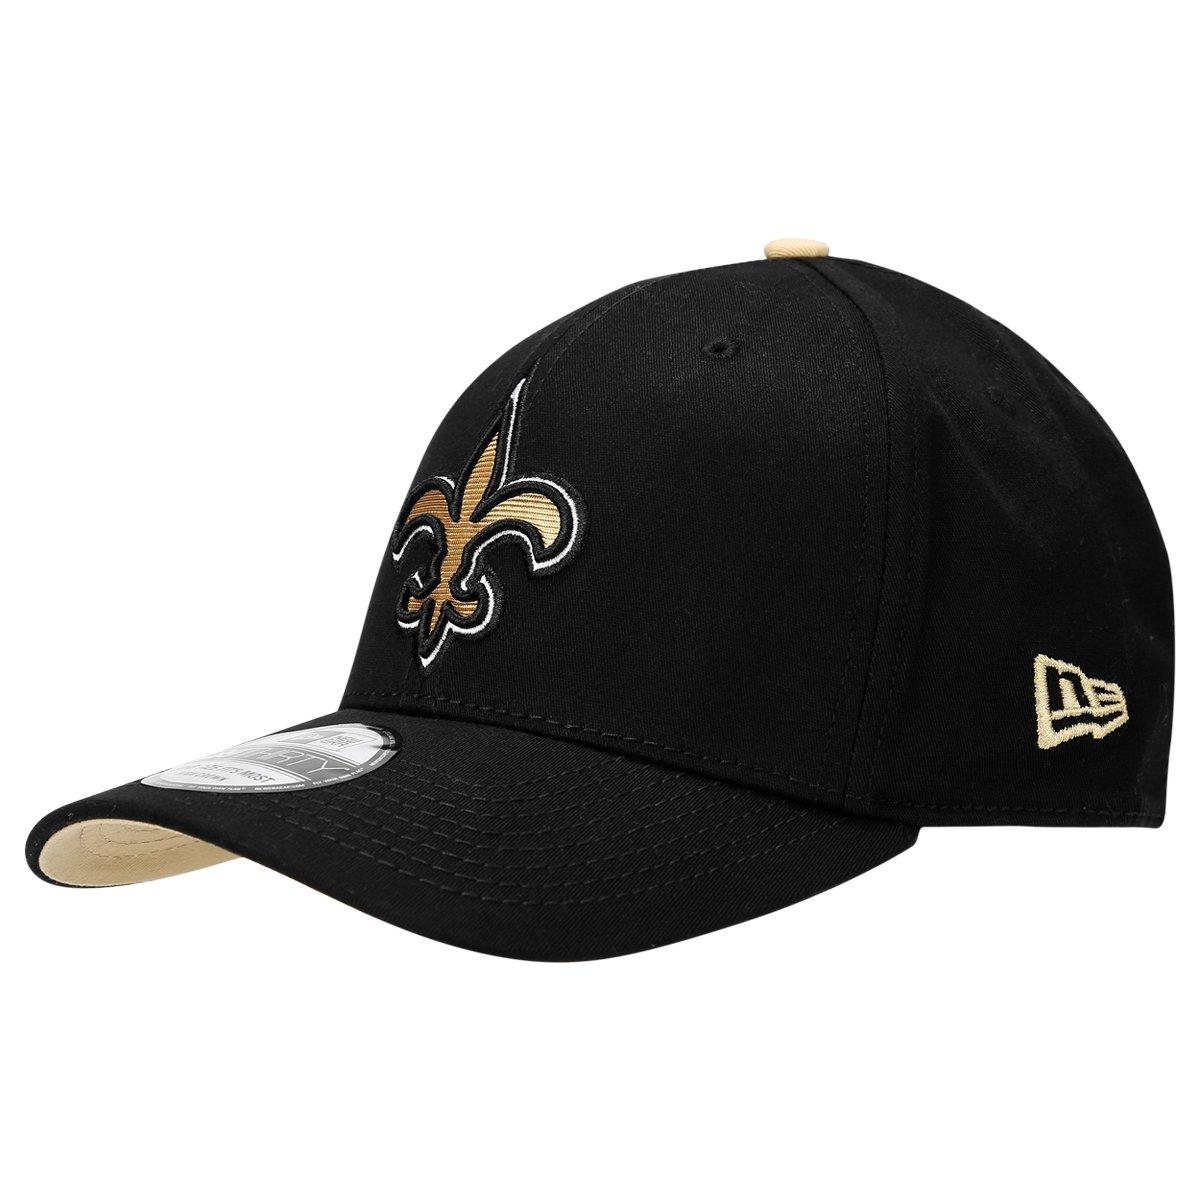 d594b766b8 Boné New Era 3930 NFL Ever New Orleans Saints Tc - Compre Agora ...